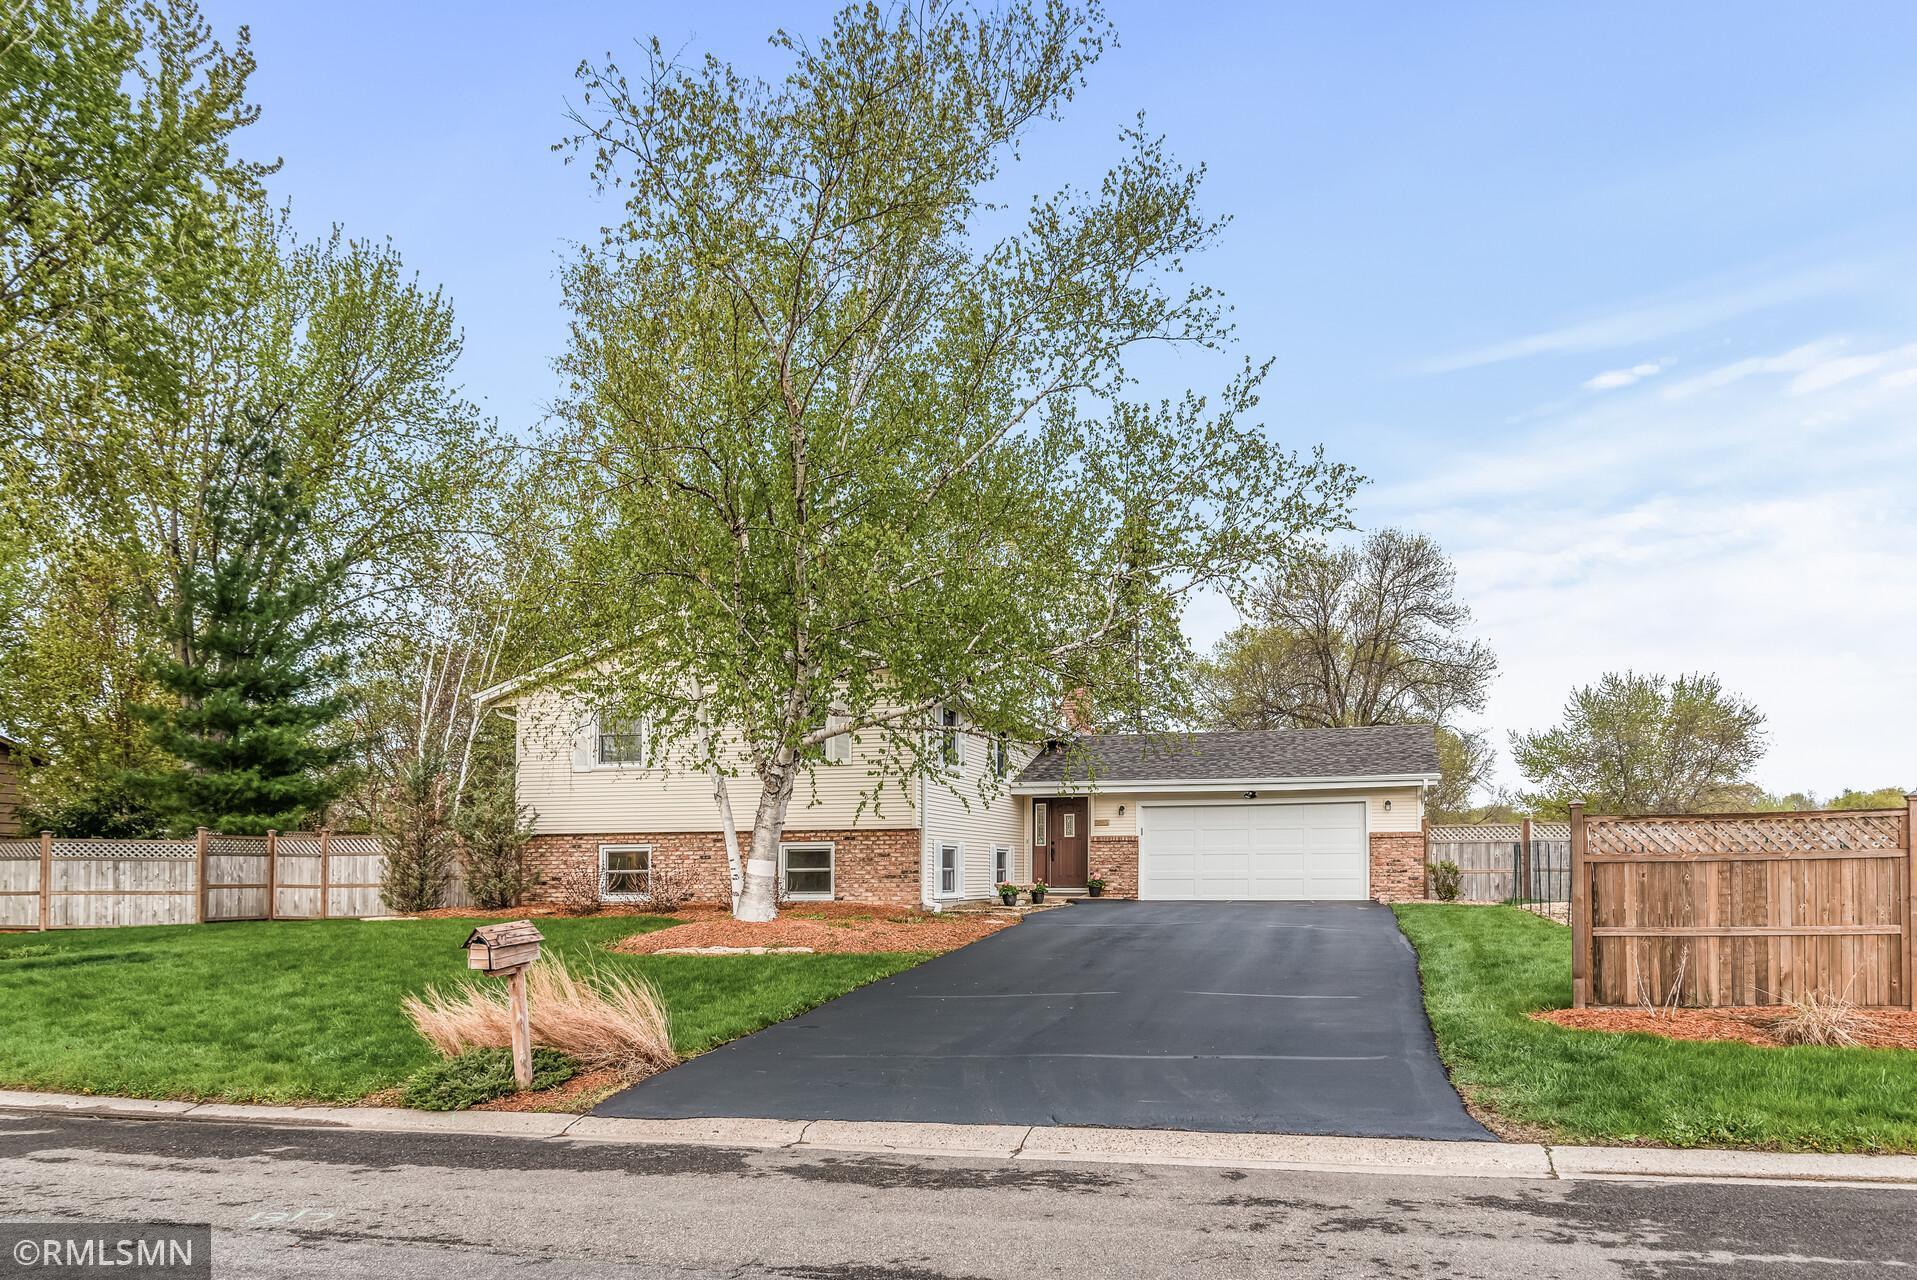 9440 Colorado Avenue S, Bloomington MN 55438 - Photo 1